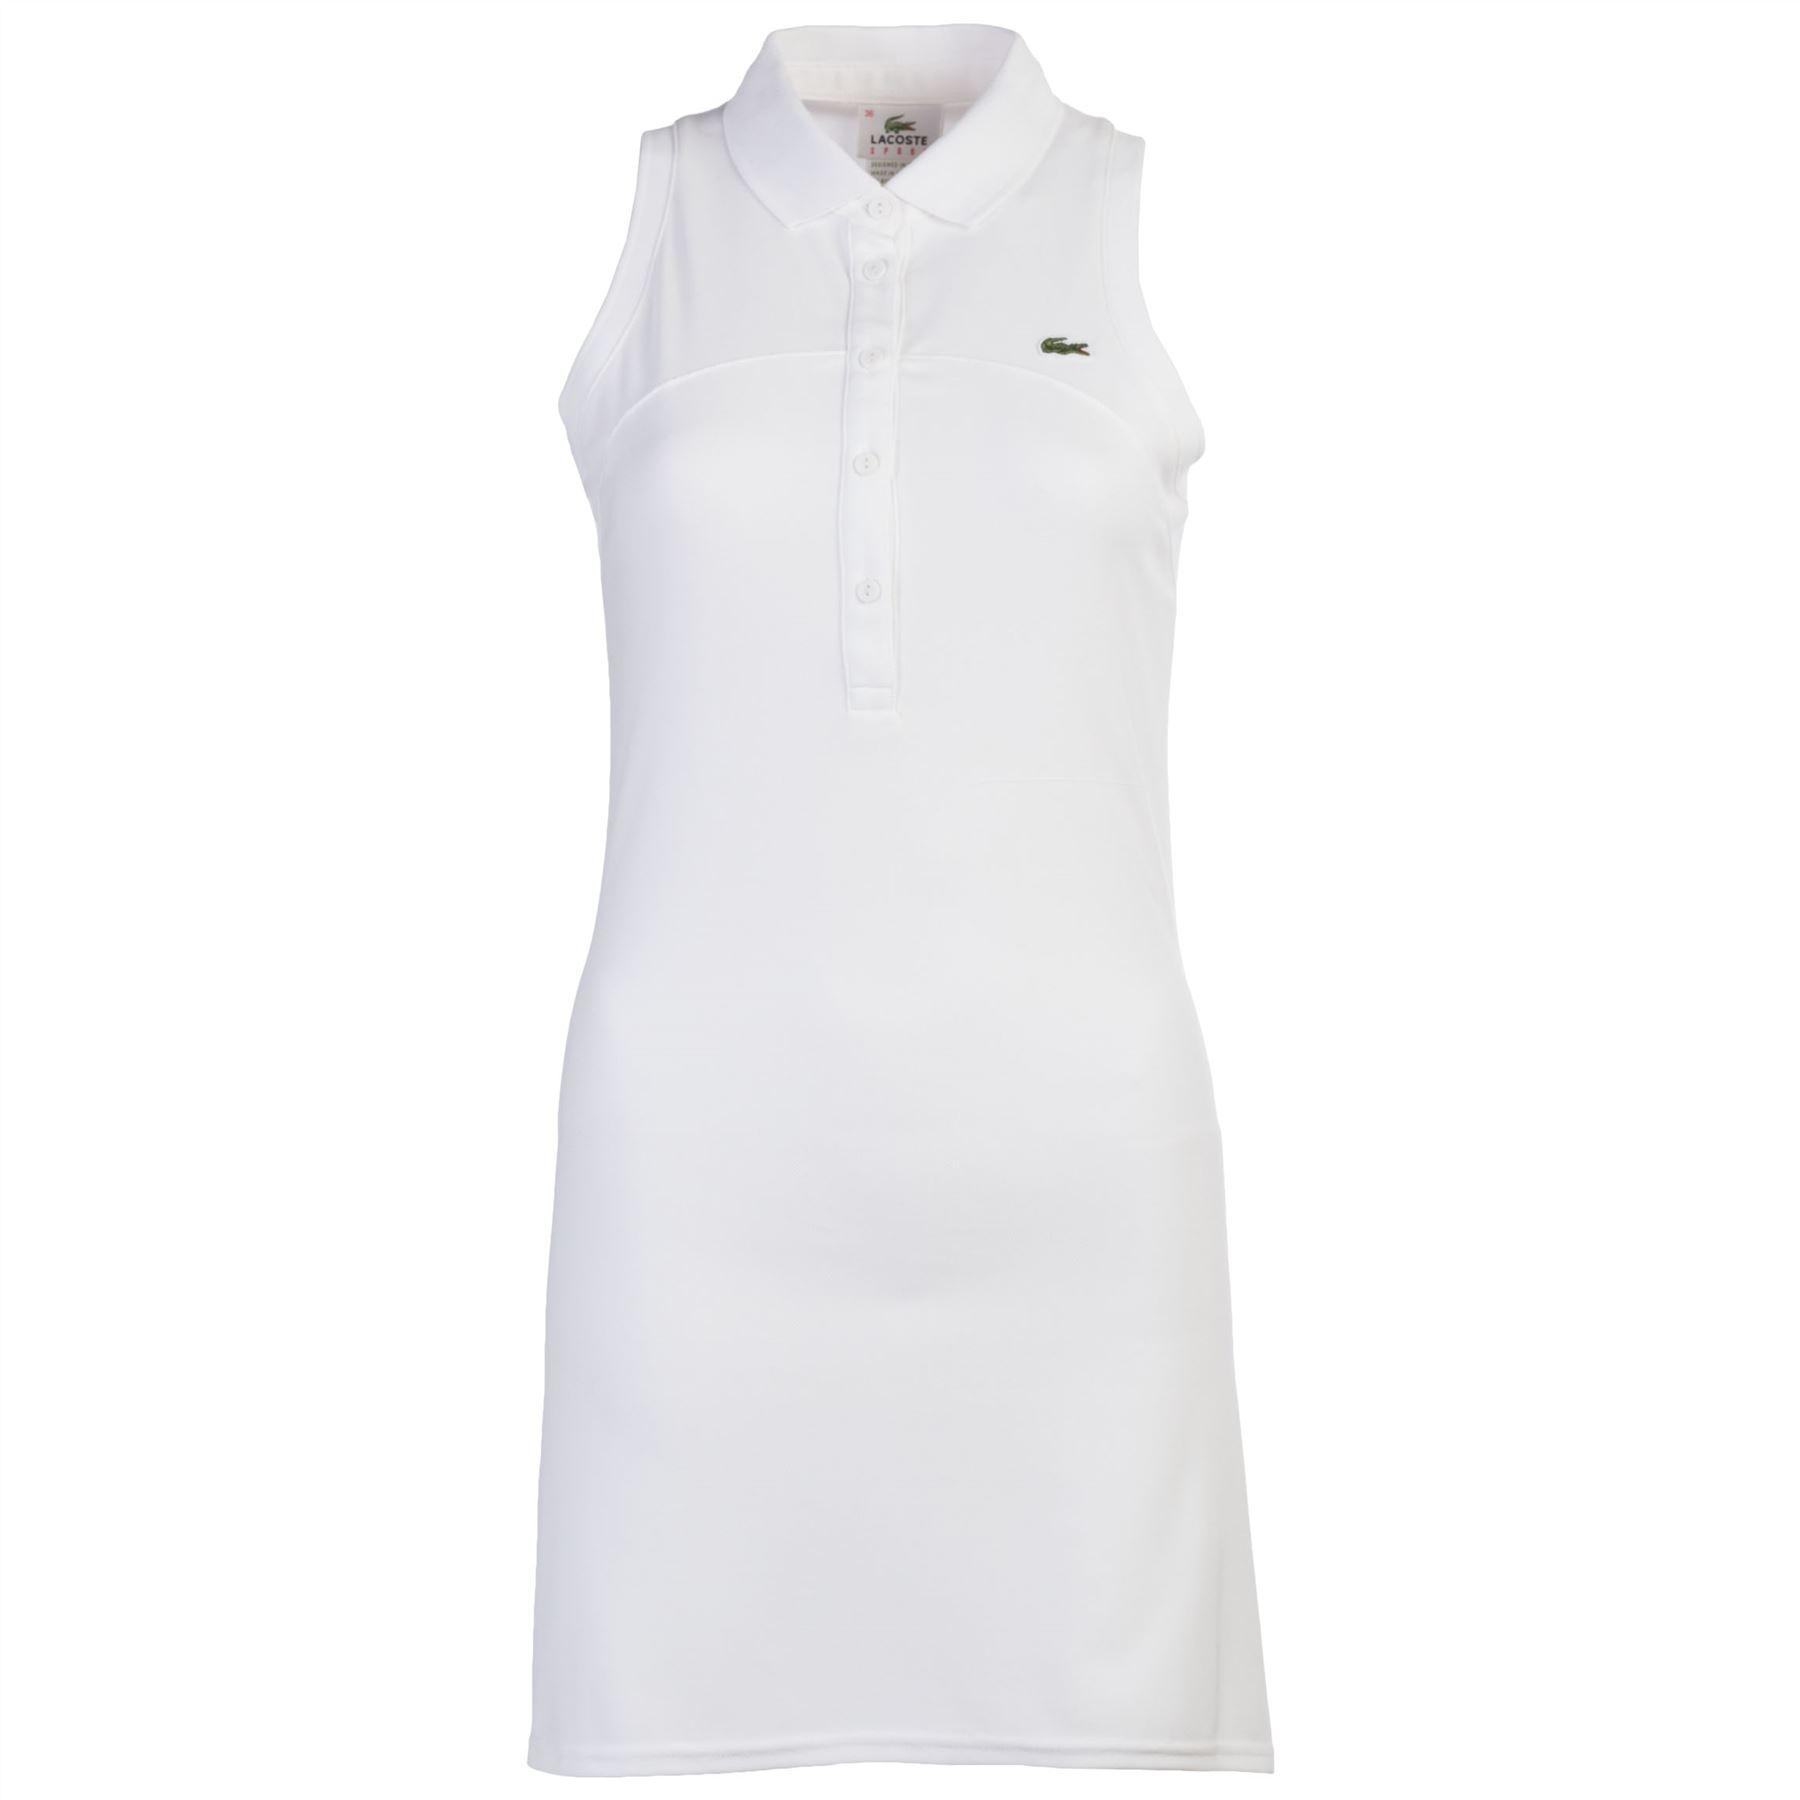 Lacoste Women 039 S Sleeveless Polo Dress Running